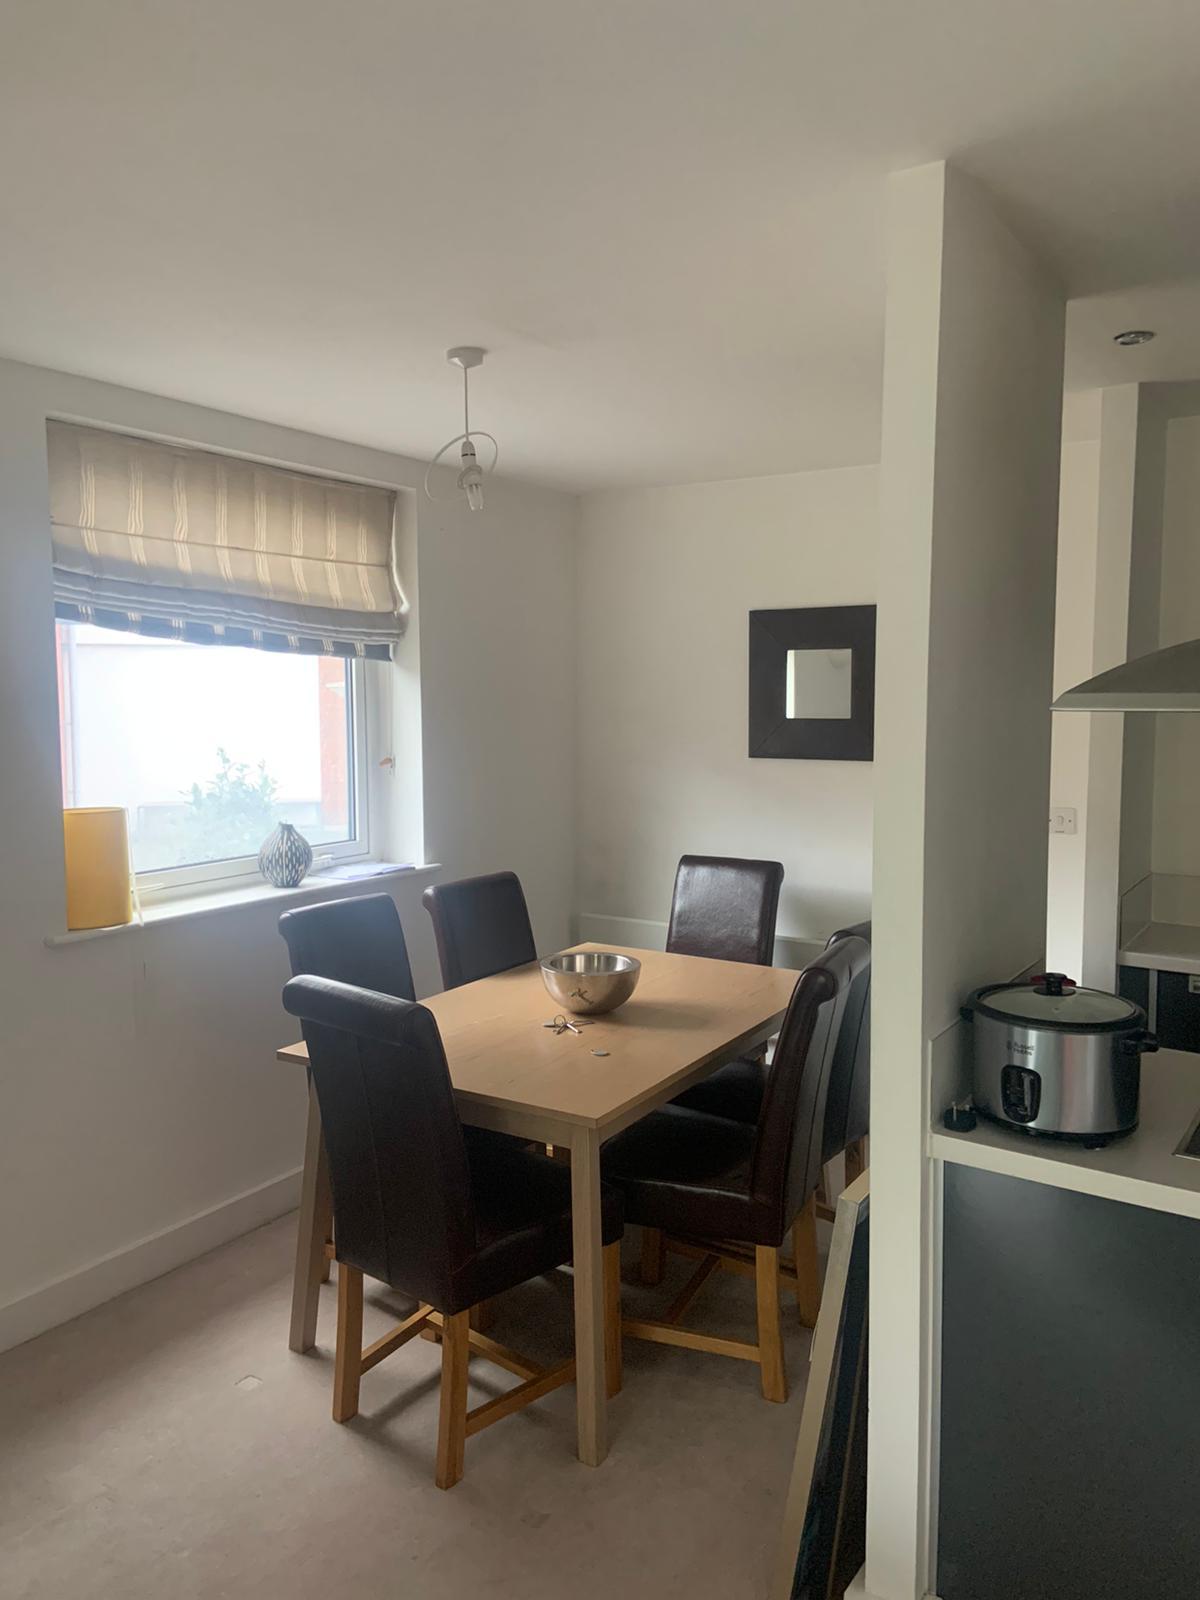 Dining area at Ocean Village Serviced Apartments, Ocean Village, Southampton